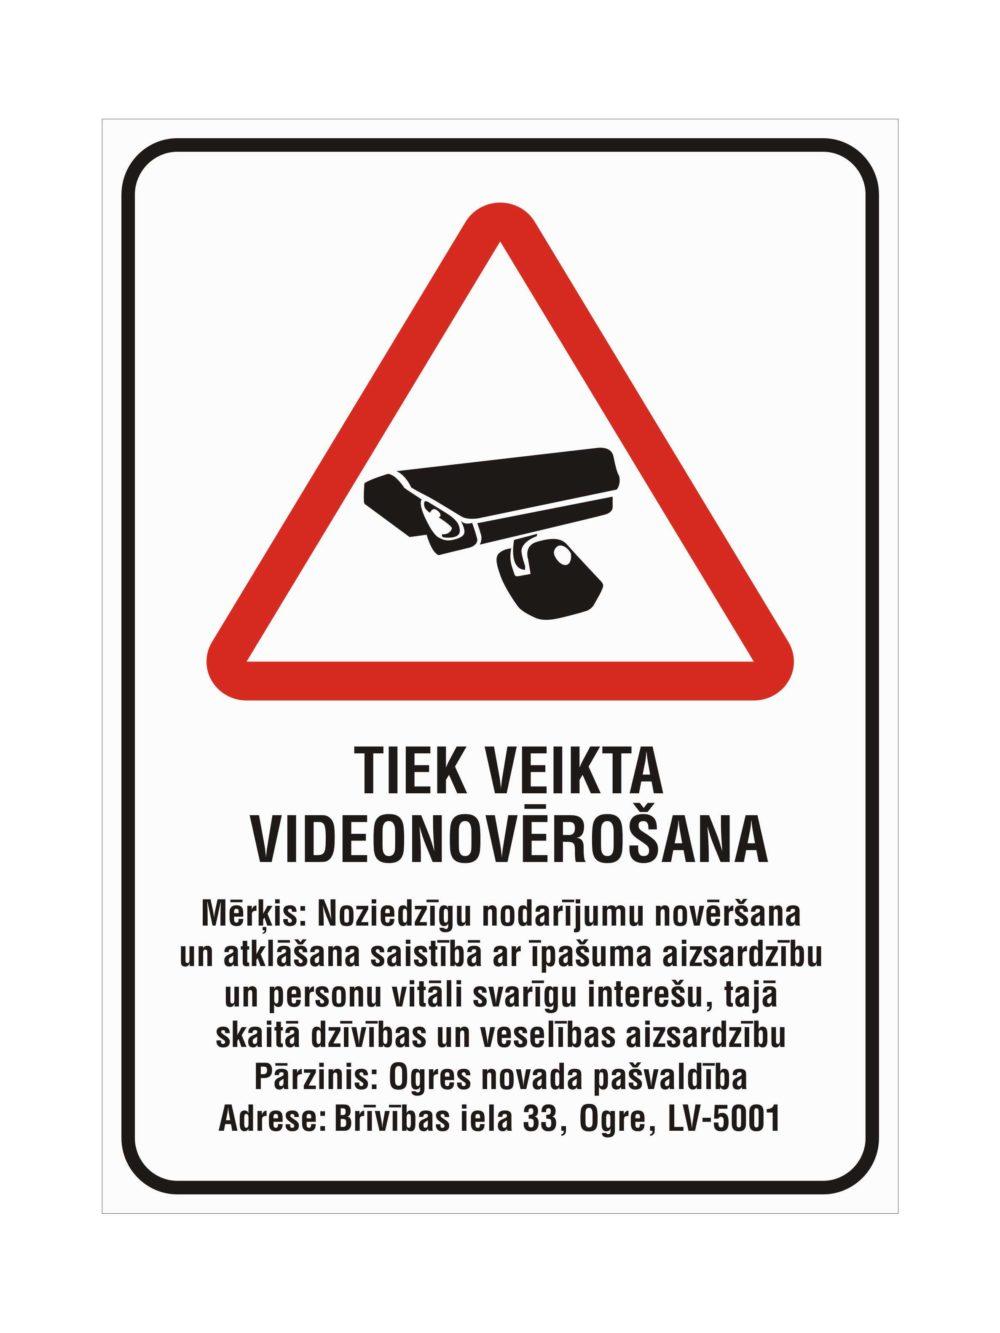 LATSIGN-informativa bridinajuma zime-Videonoverošana_VDAR_420x440